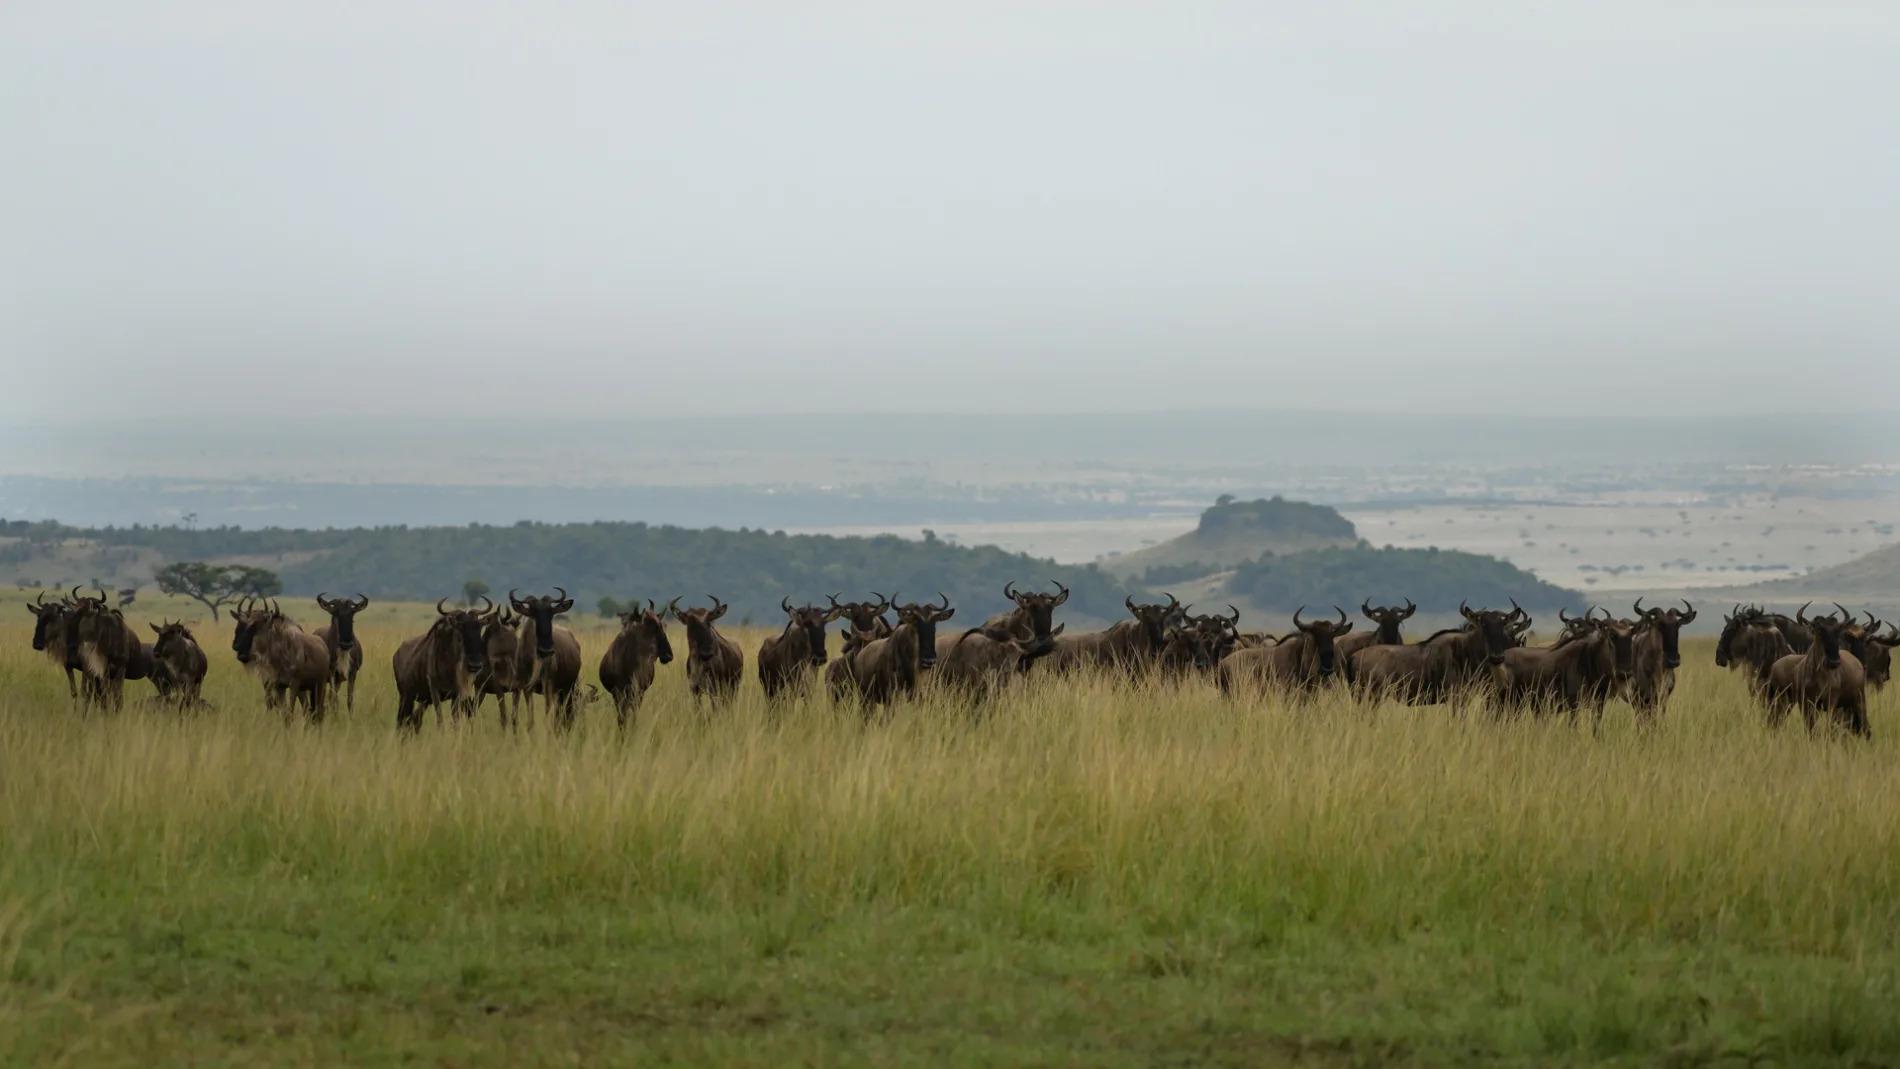 Wildebeest before crossing